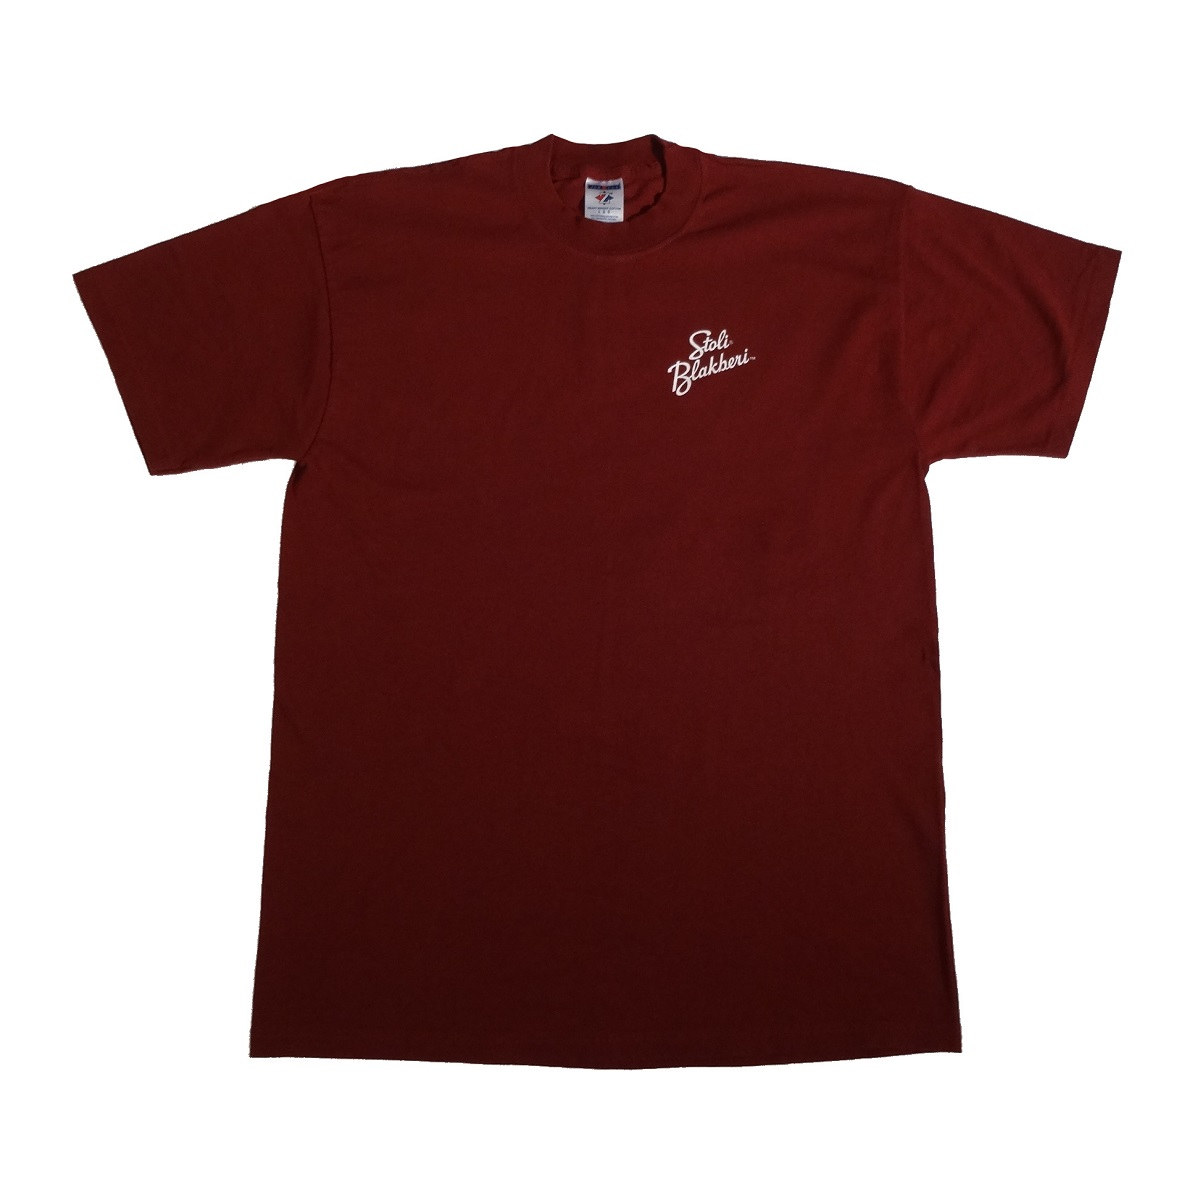 stoli blackberry vodka promo t shirt front